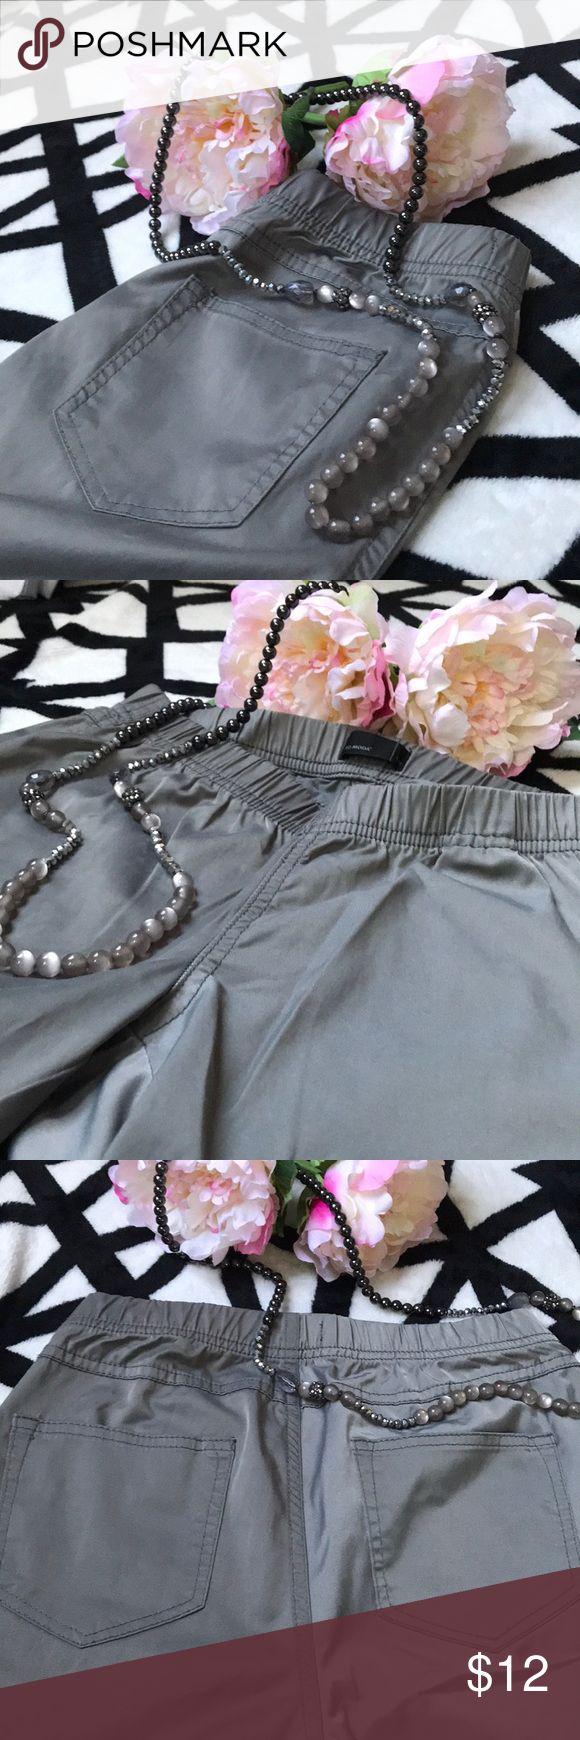 🔥🔥VERO MODA silver jeggings!🔥🔥 Silver and shine jeggings. Elegant and classy. Size S. Never used. Vero Moda Pants Leggings